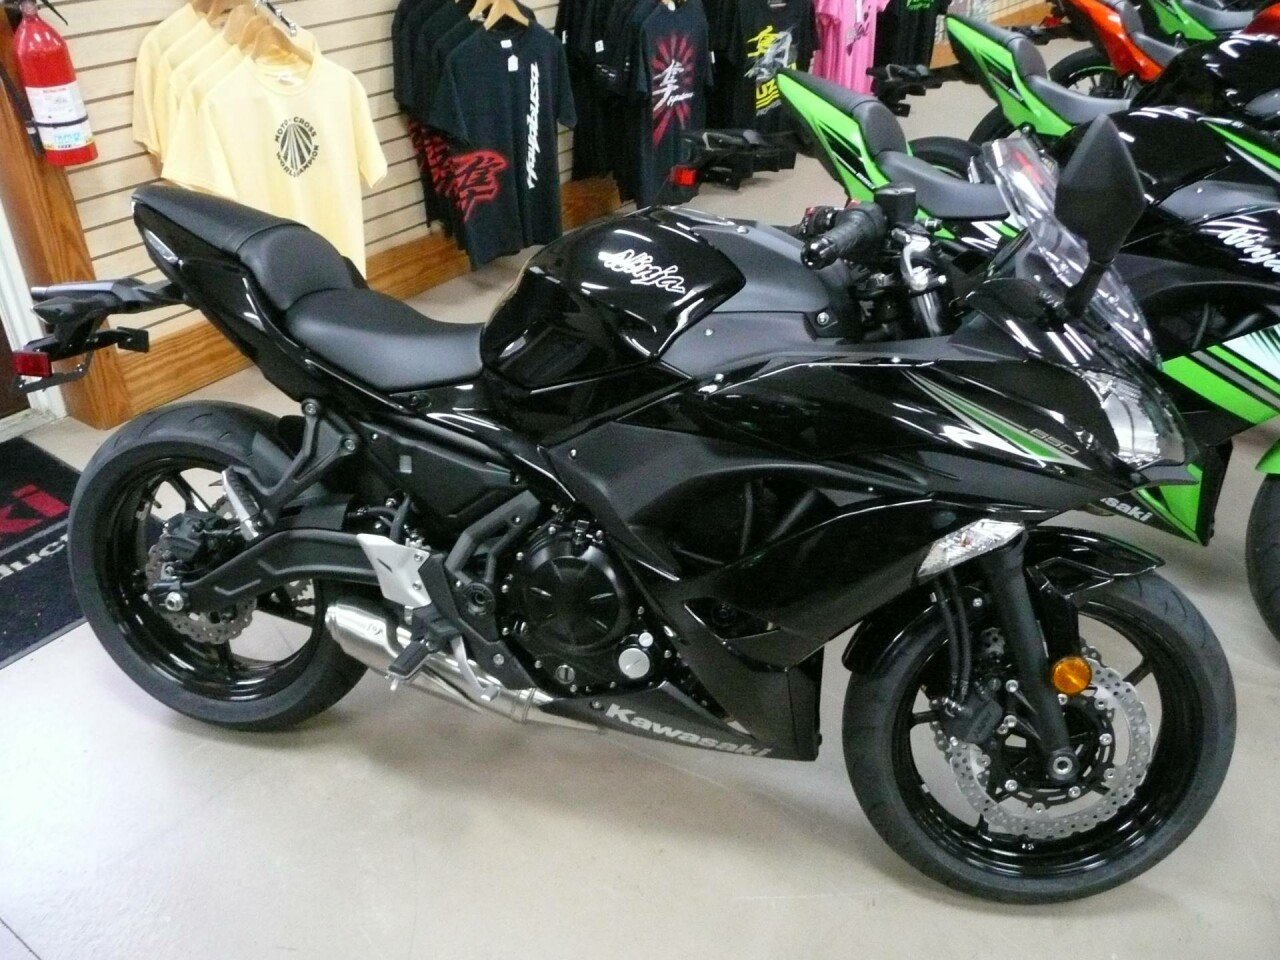 2017 Kawasaki Ninja 650 for sale near Unionville, Virginia ...